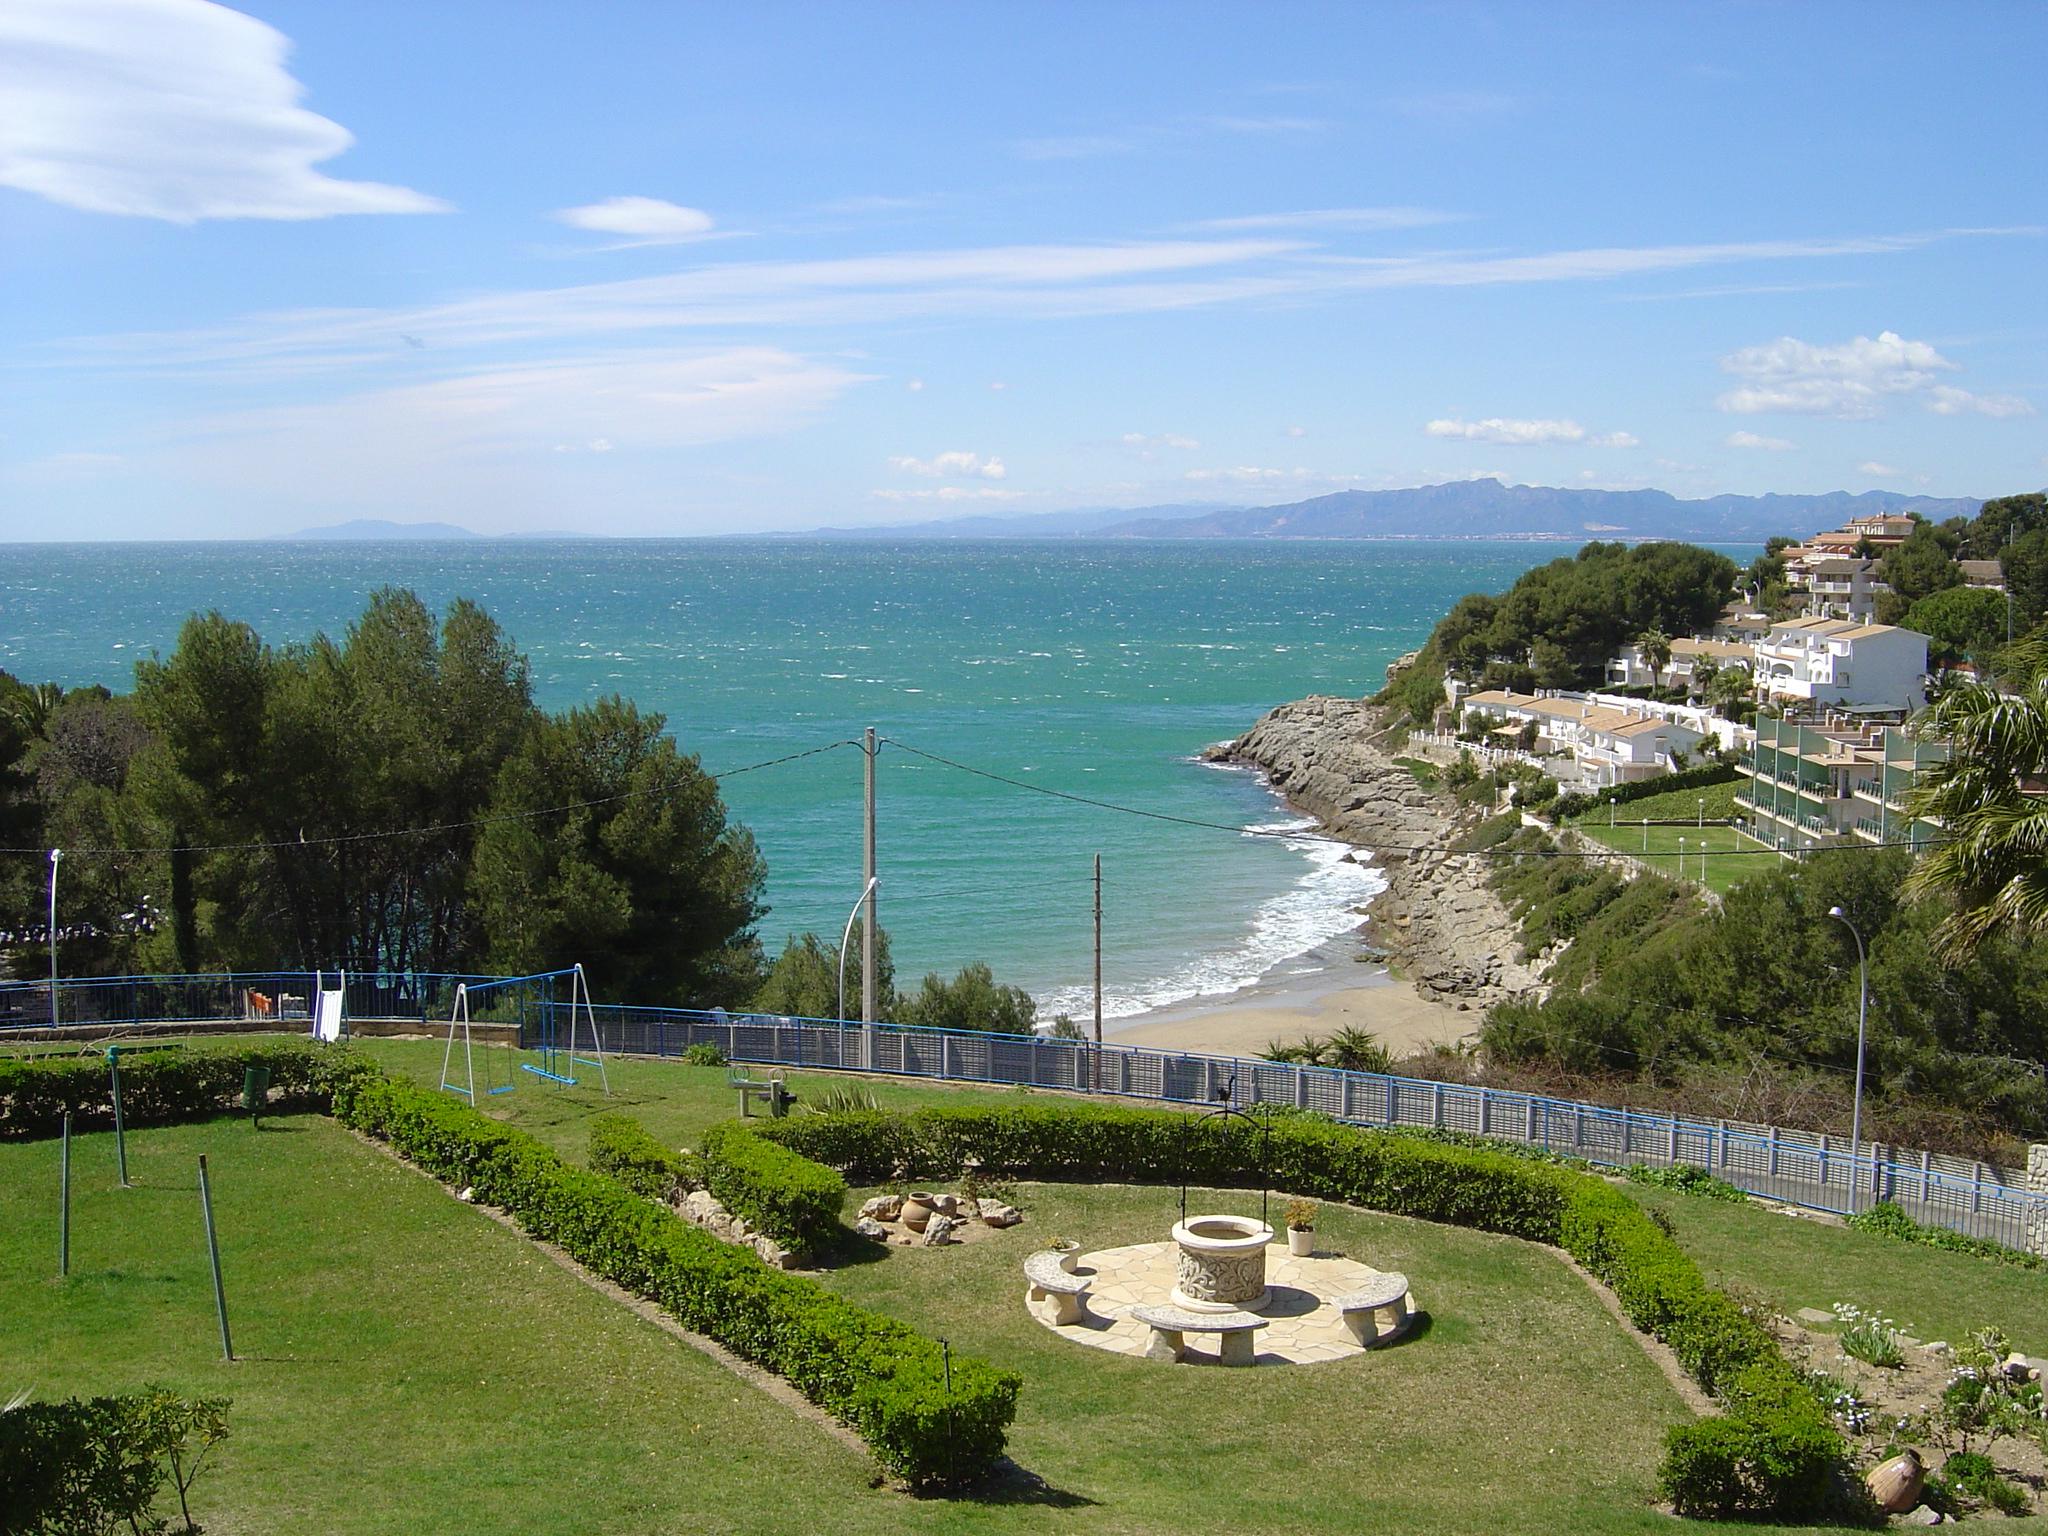 Playa Cala Vinya